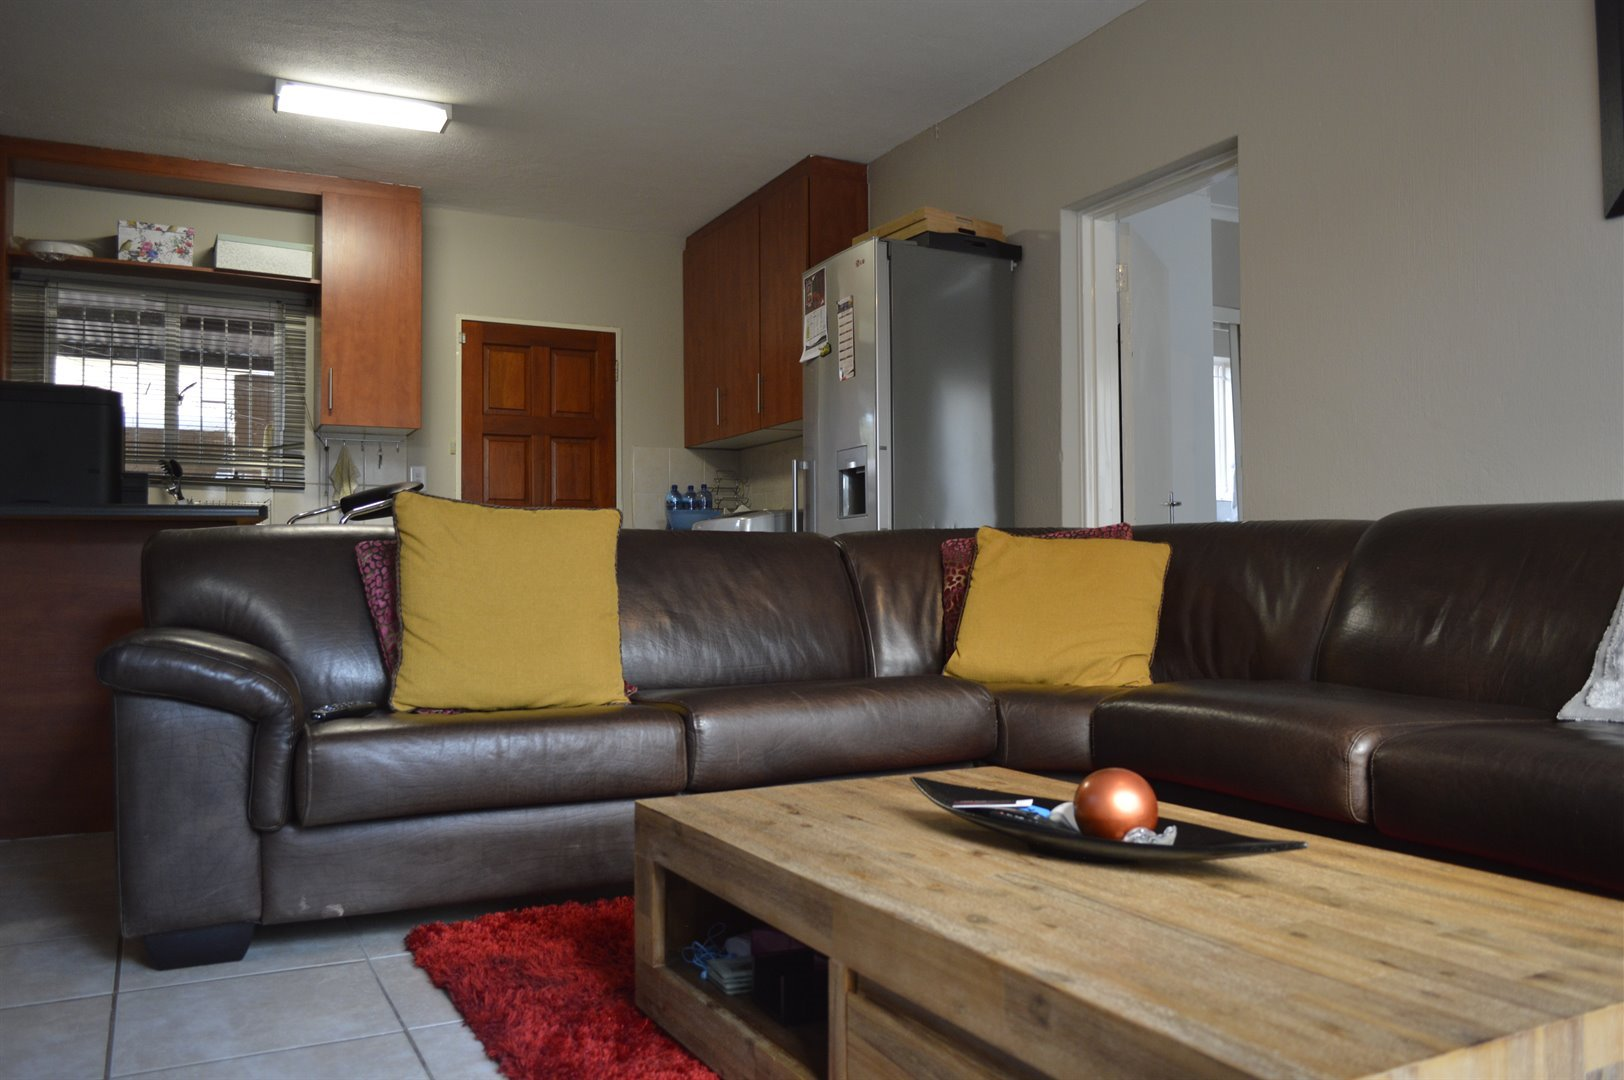 Heuwelsig Estate property for sale. Ref No: 13463647. Picture no 2